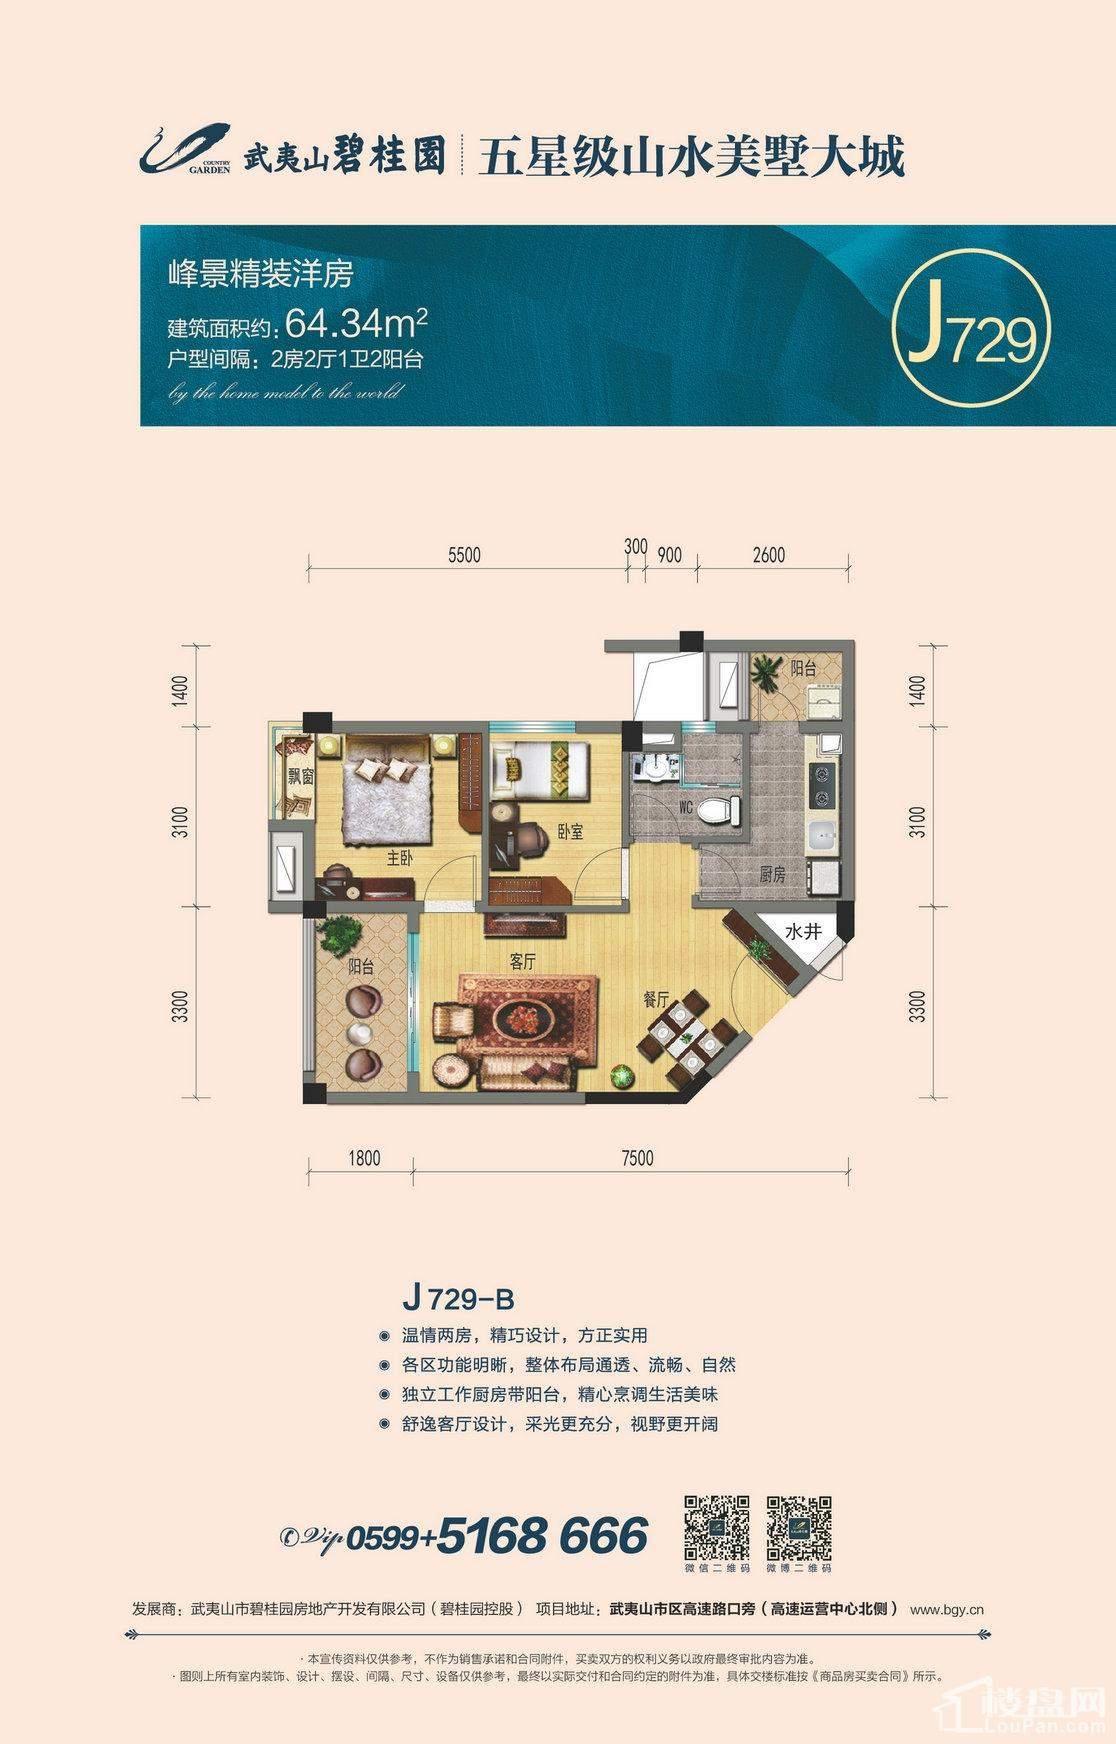 J729-B 峰景精装洋房